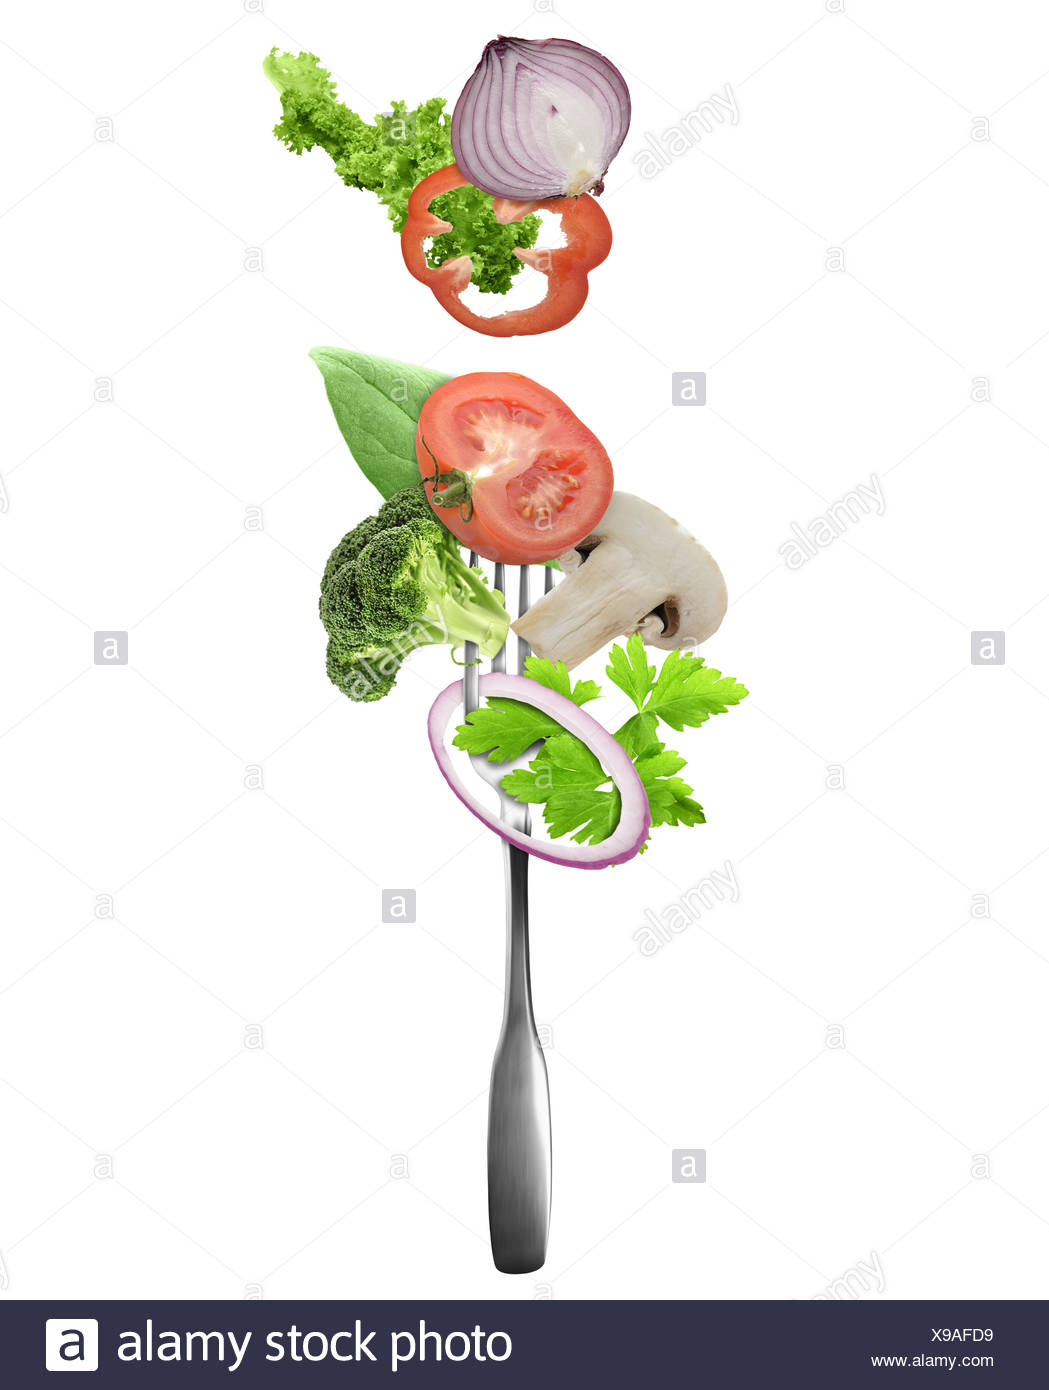 Fresh Vegetables On A Fork - Stock Image